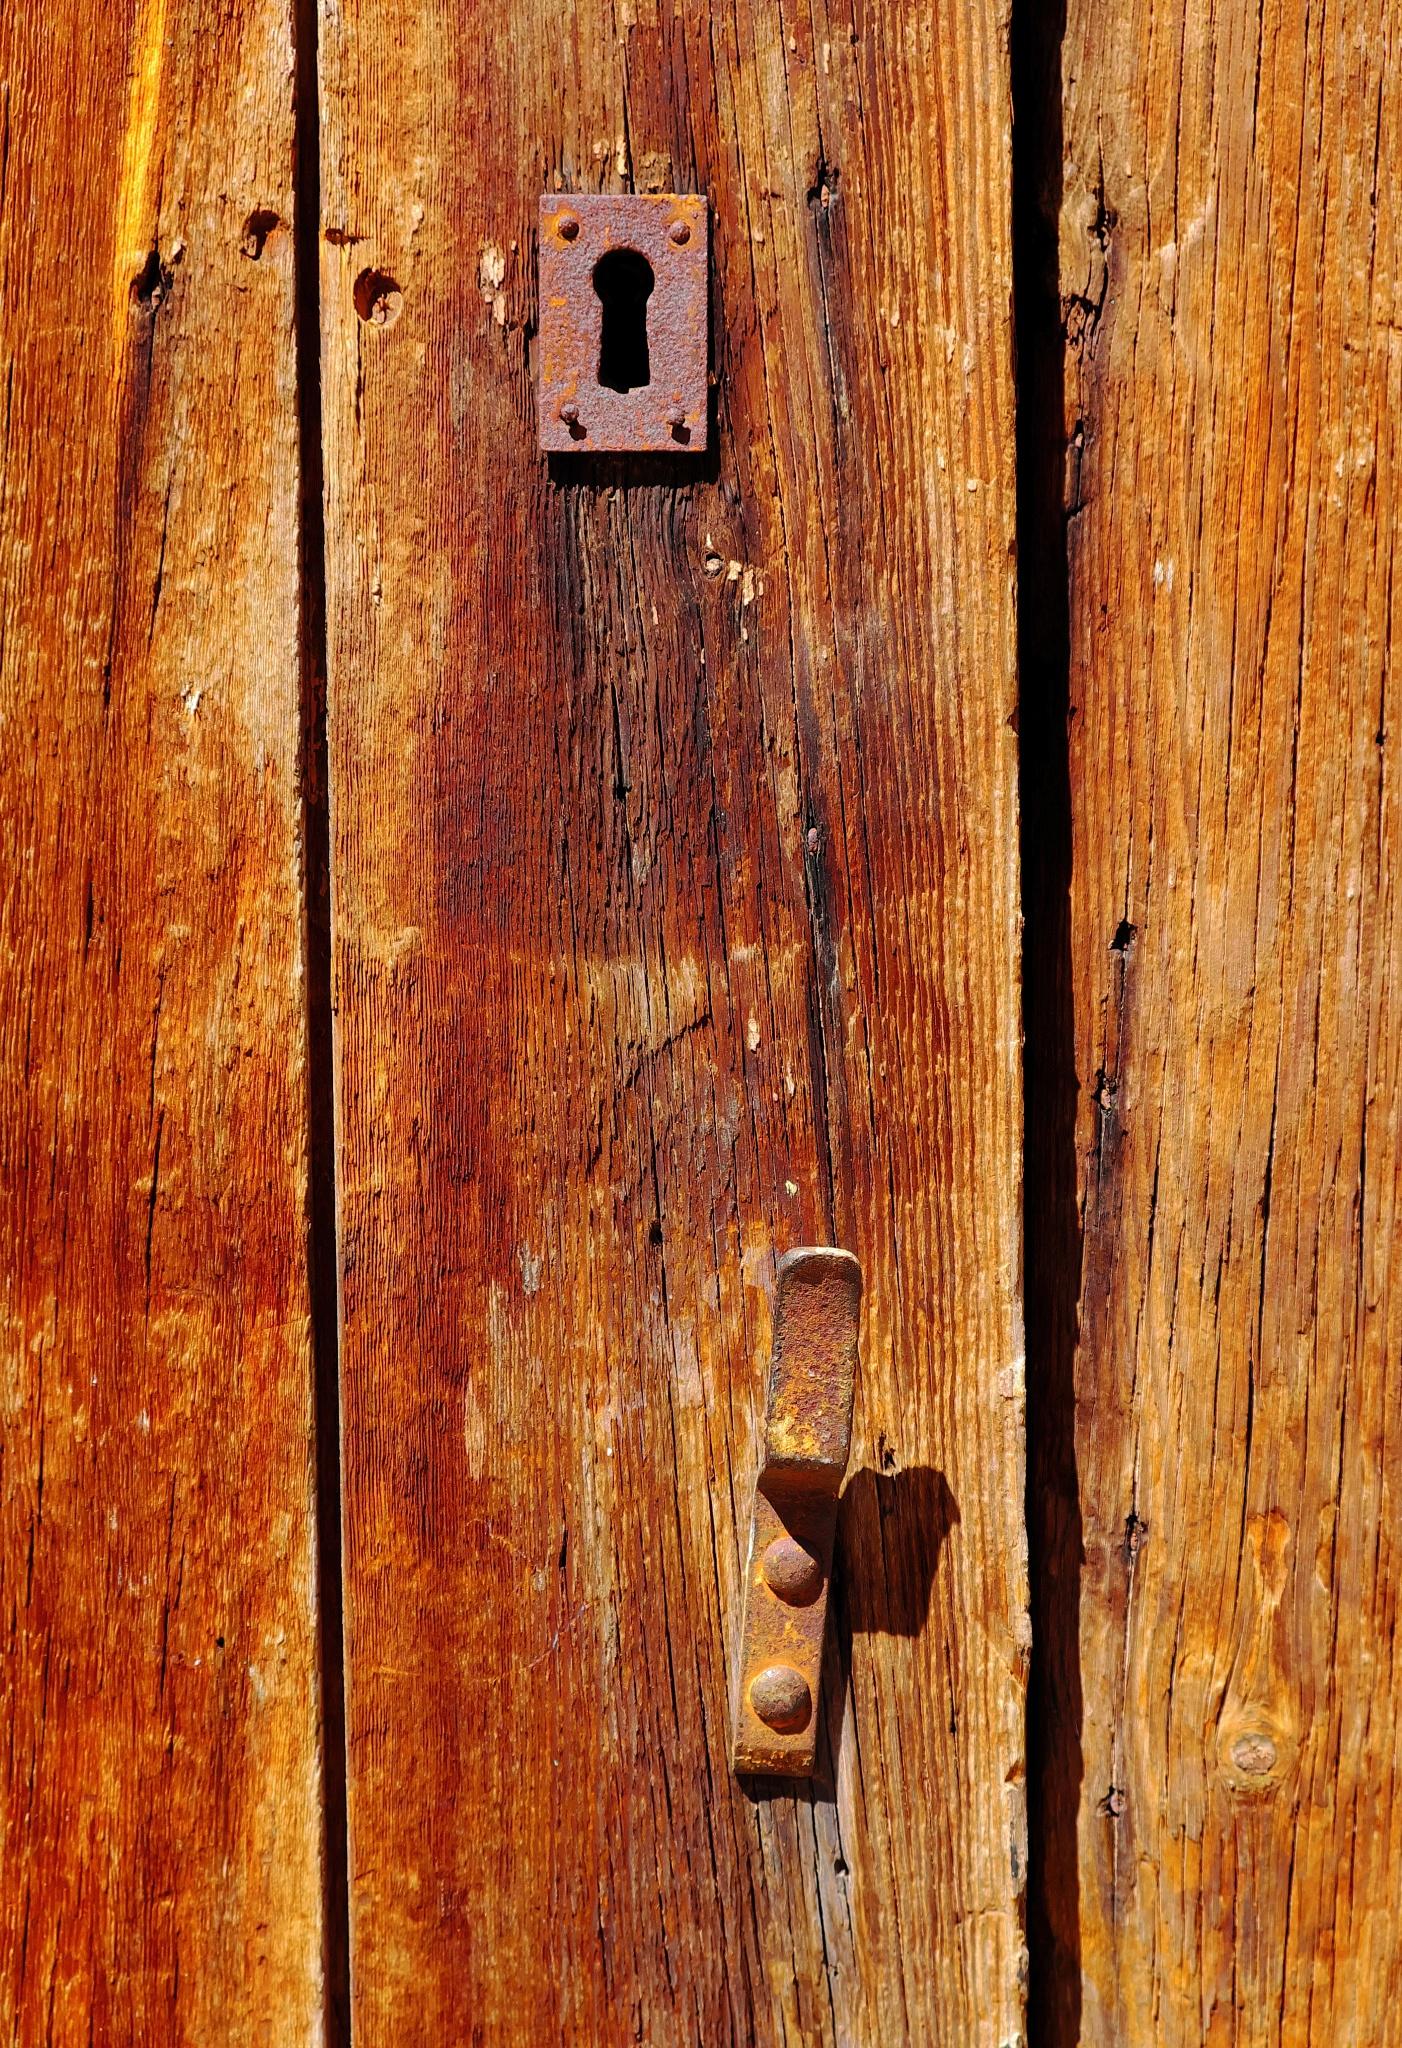 Key by Greg Roberson